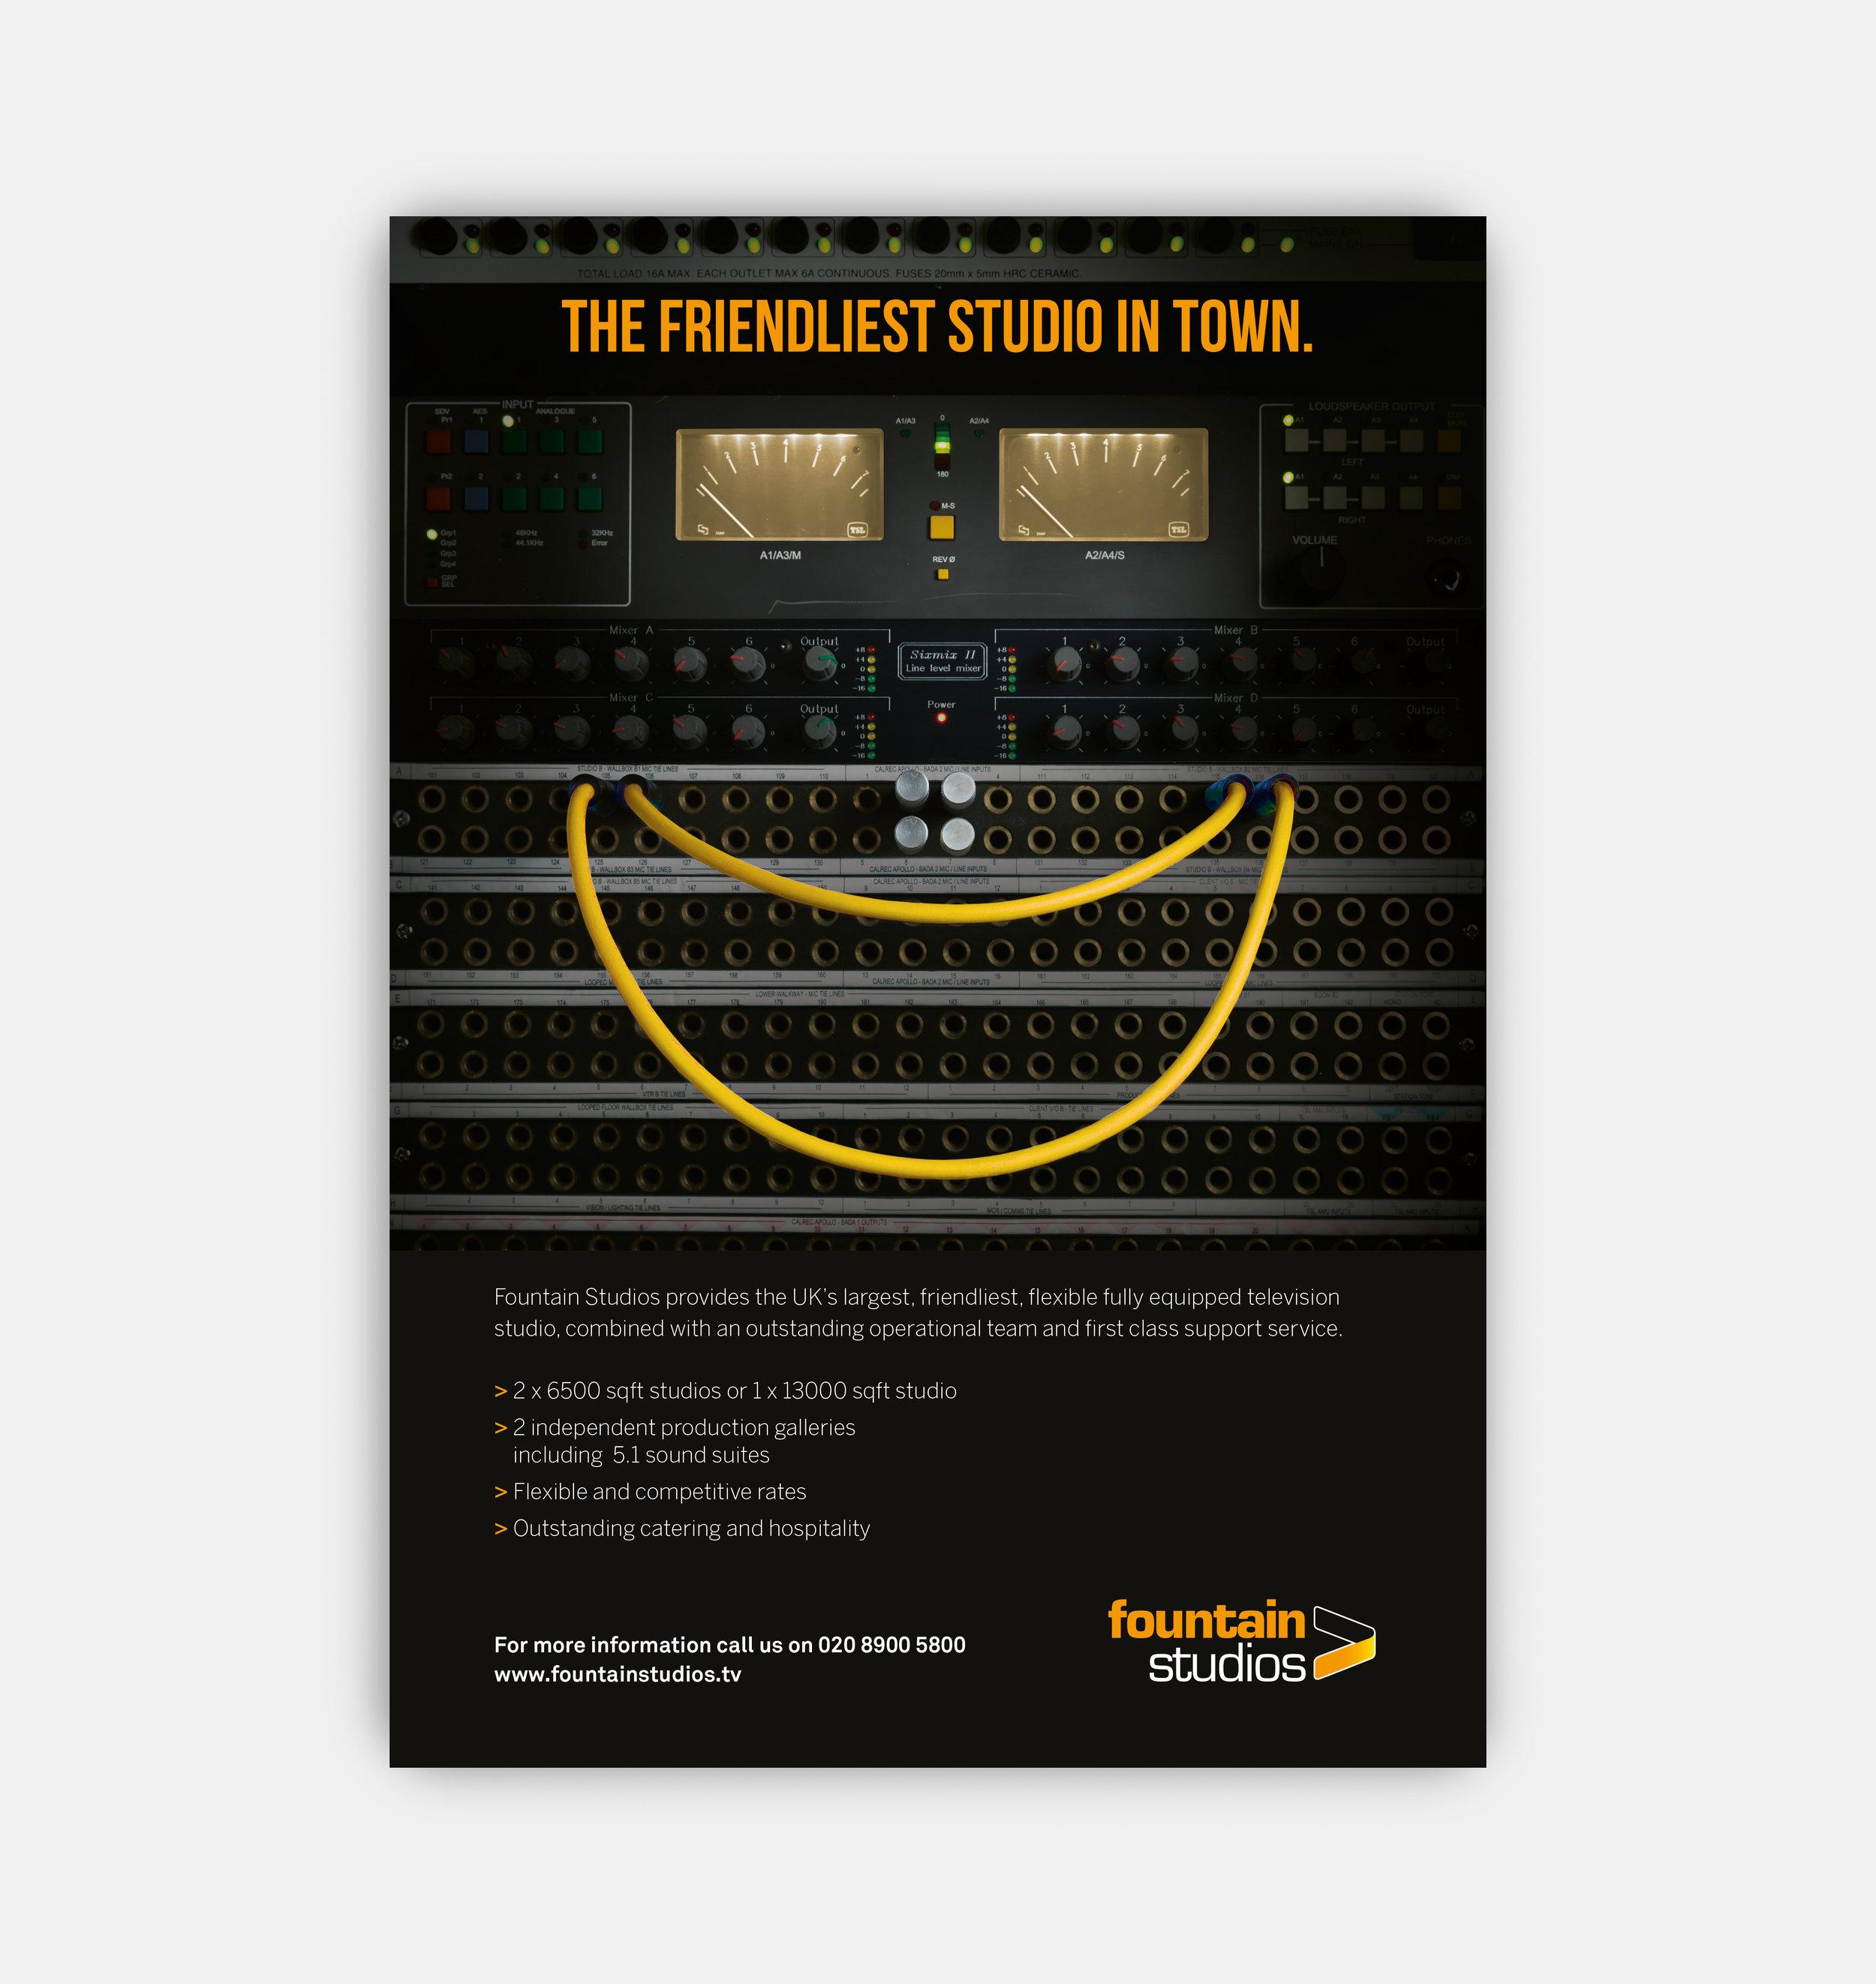 FS001 FOUNTAIN STUDIOS ADS FINAL x3.jpg